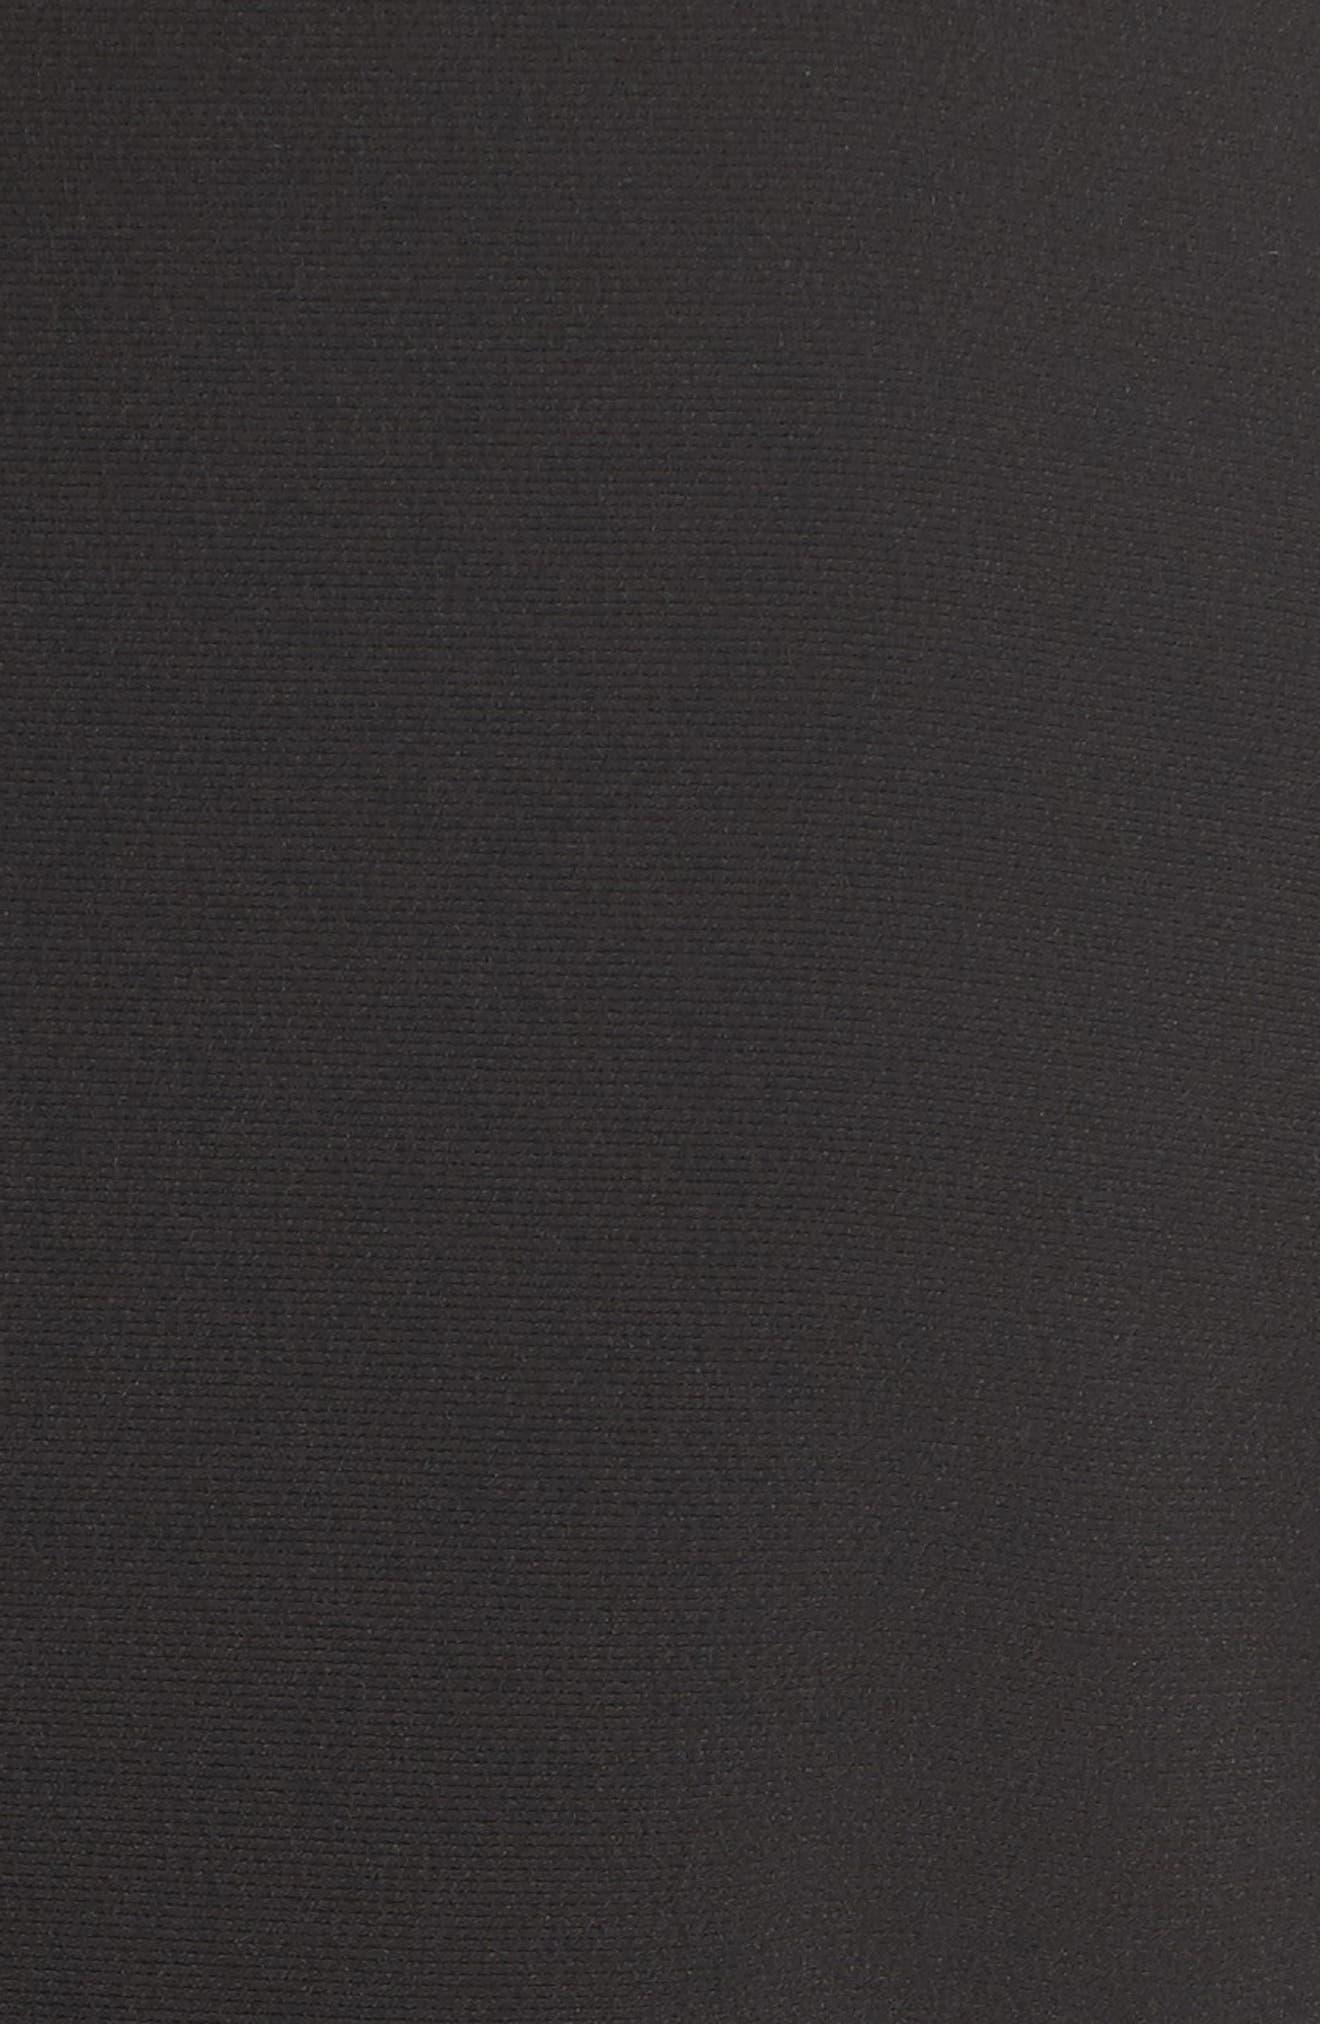 Jisuneri Crop Blazer,                             Alternate thumbnail 5, color,                             Black